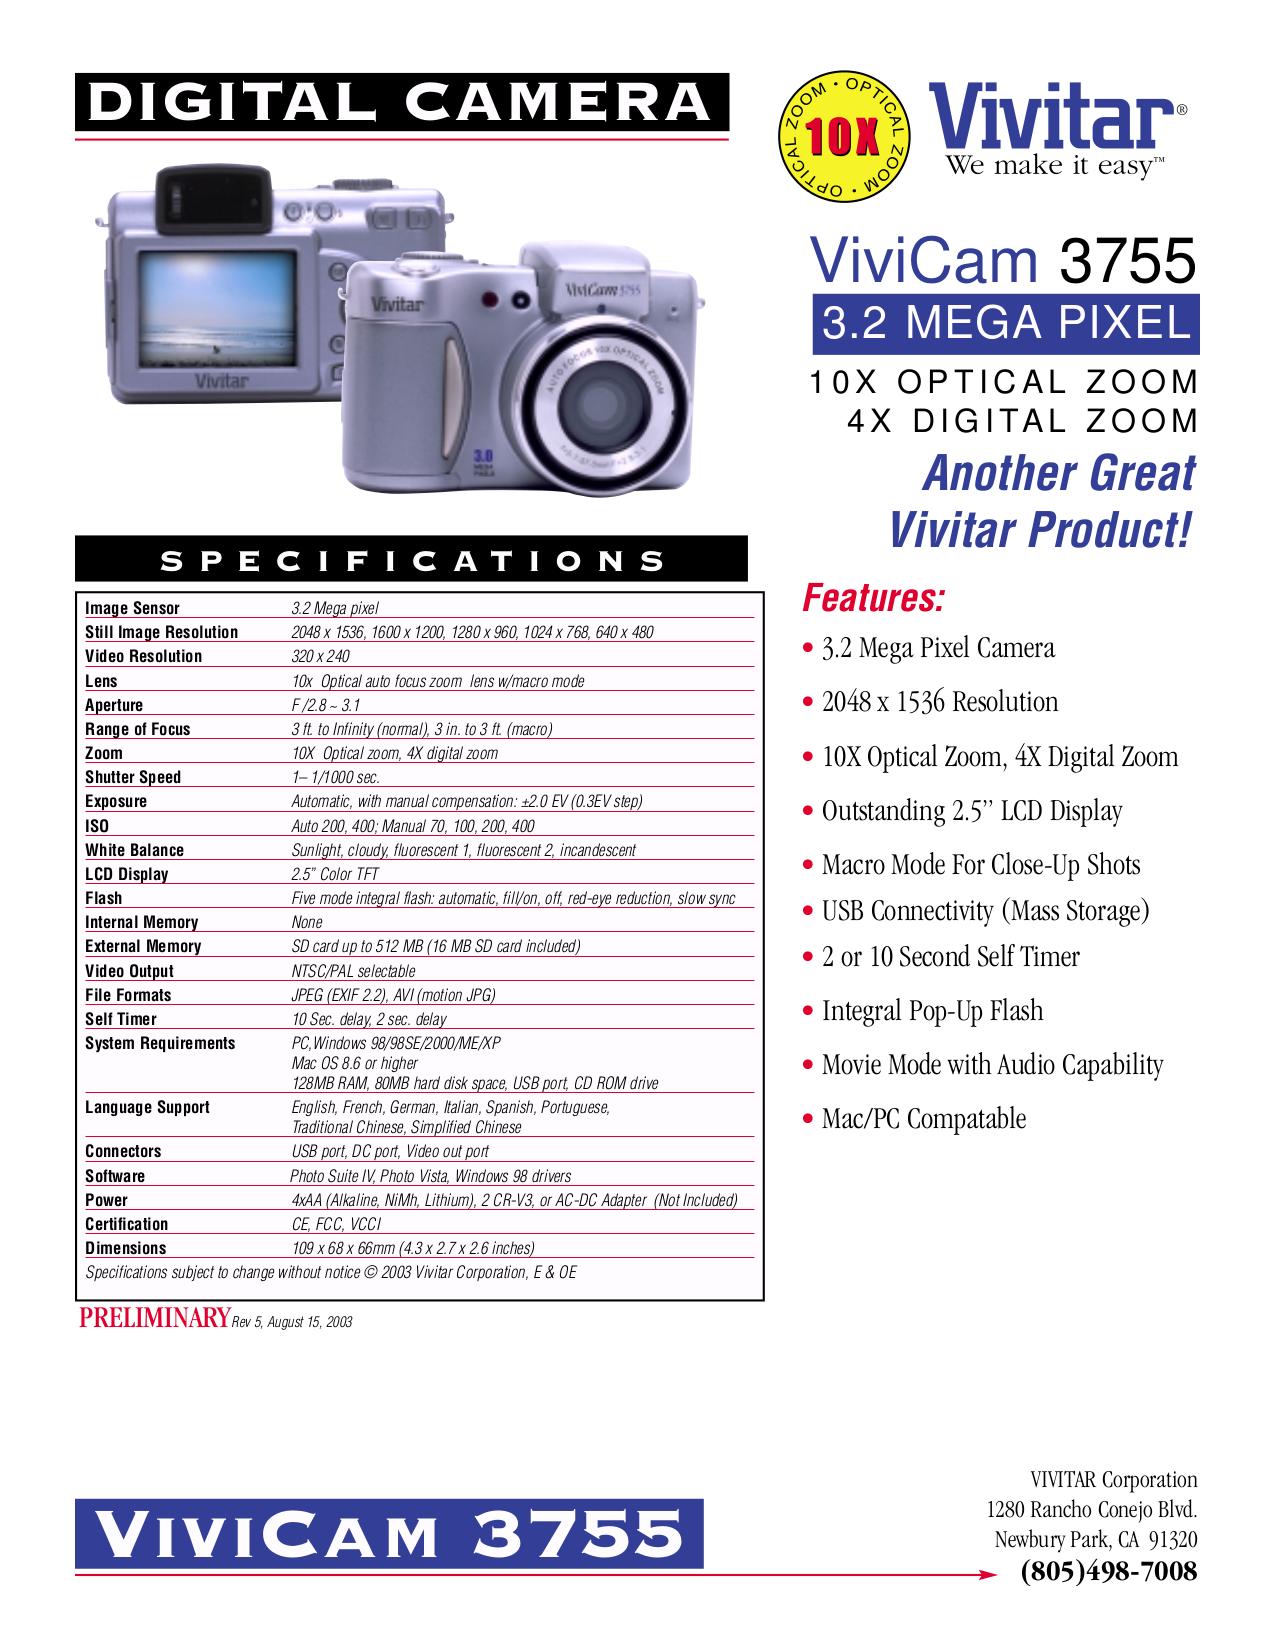 pdf for Vivitar Digital Camera Vivicam 3755 manual